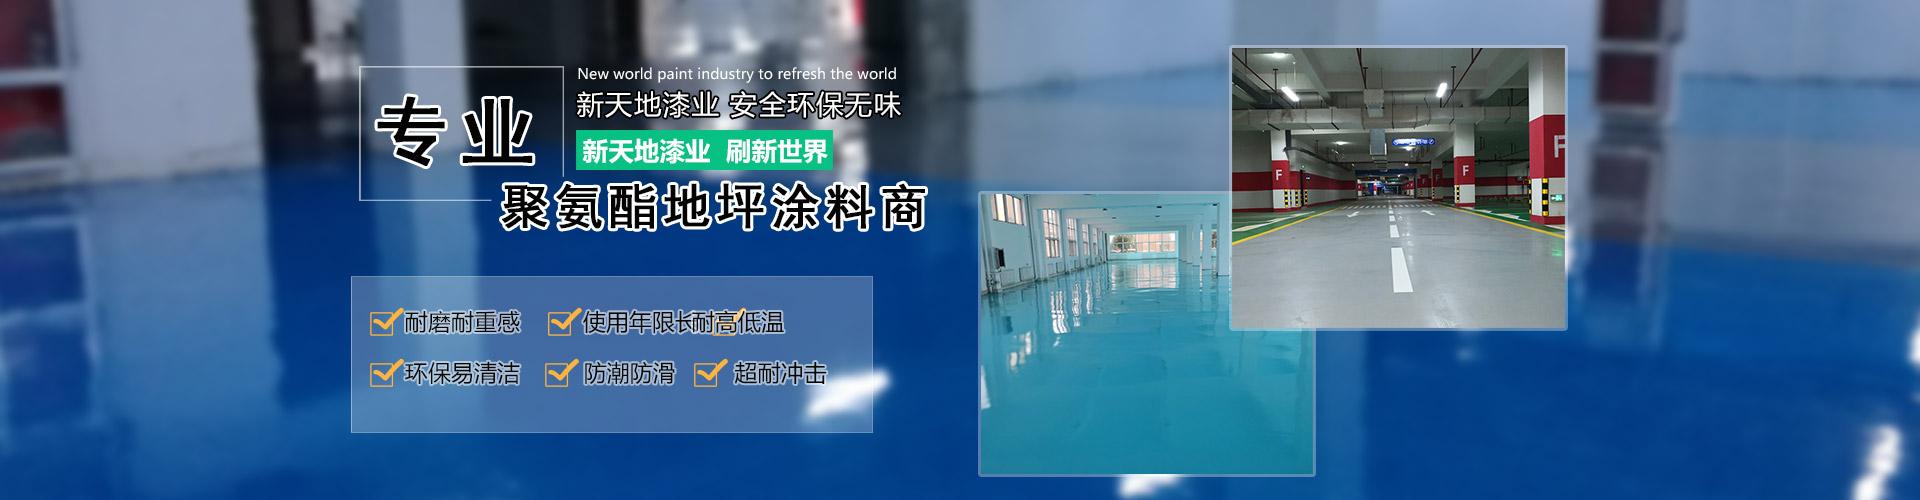 gu票推荐软件购mai_联发科概念gu_华住上市的gu票dai码